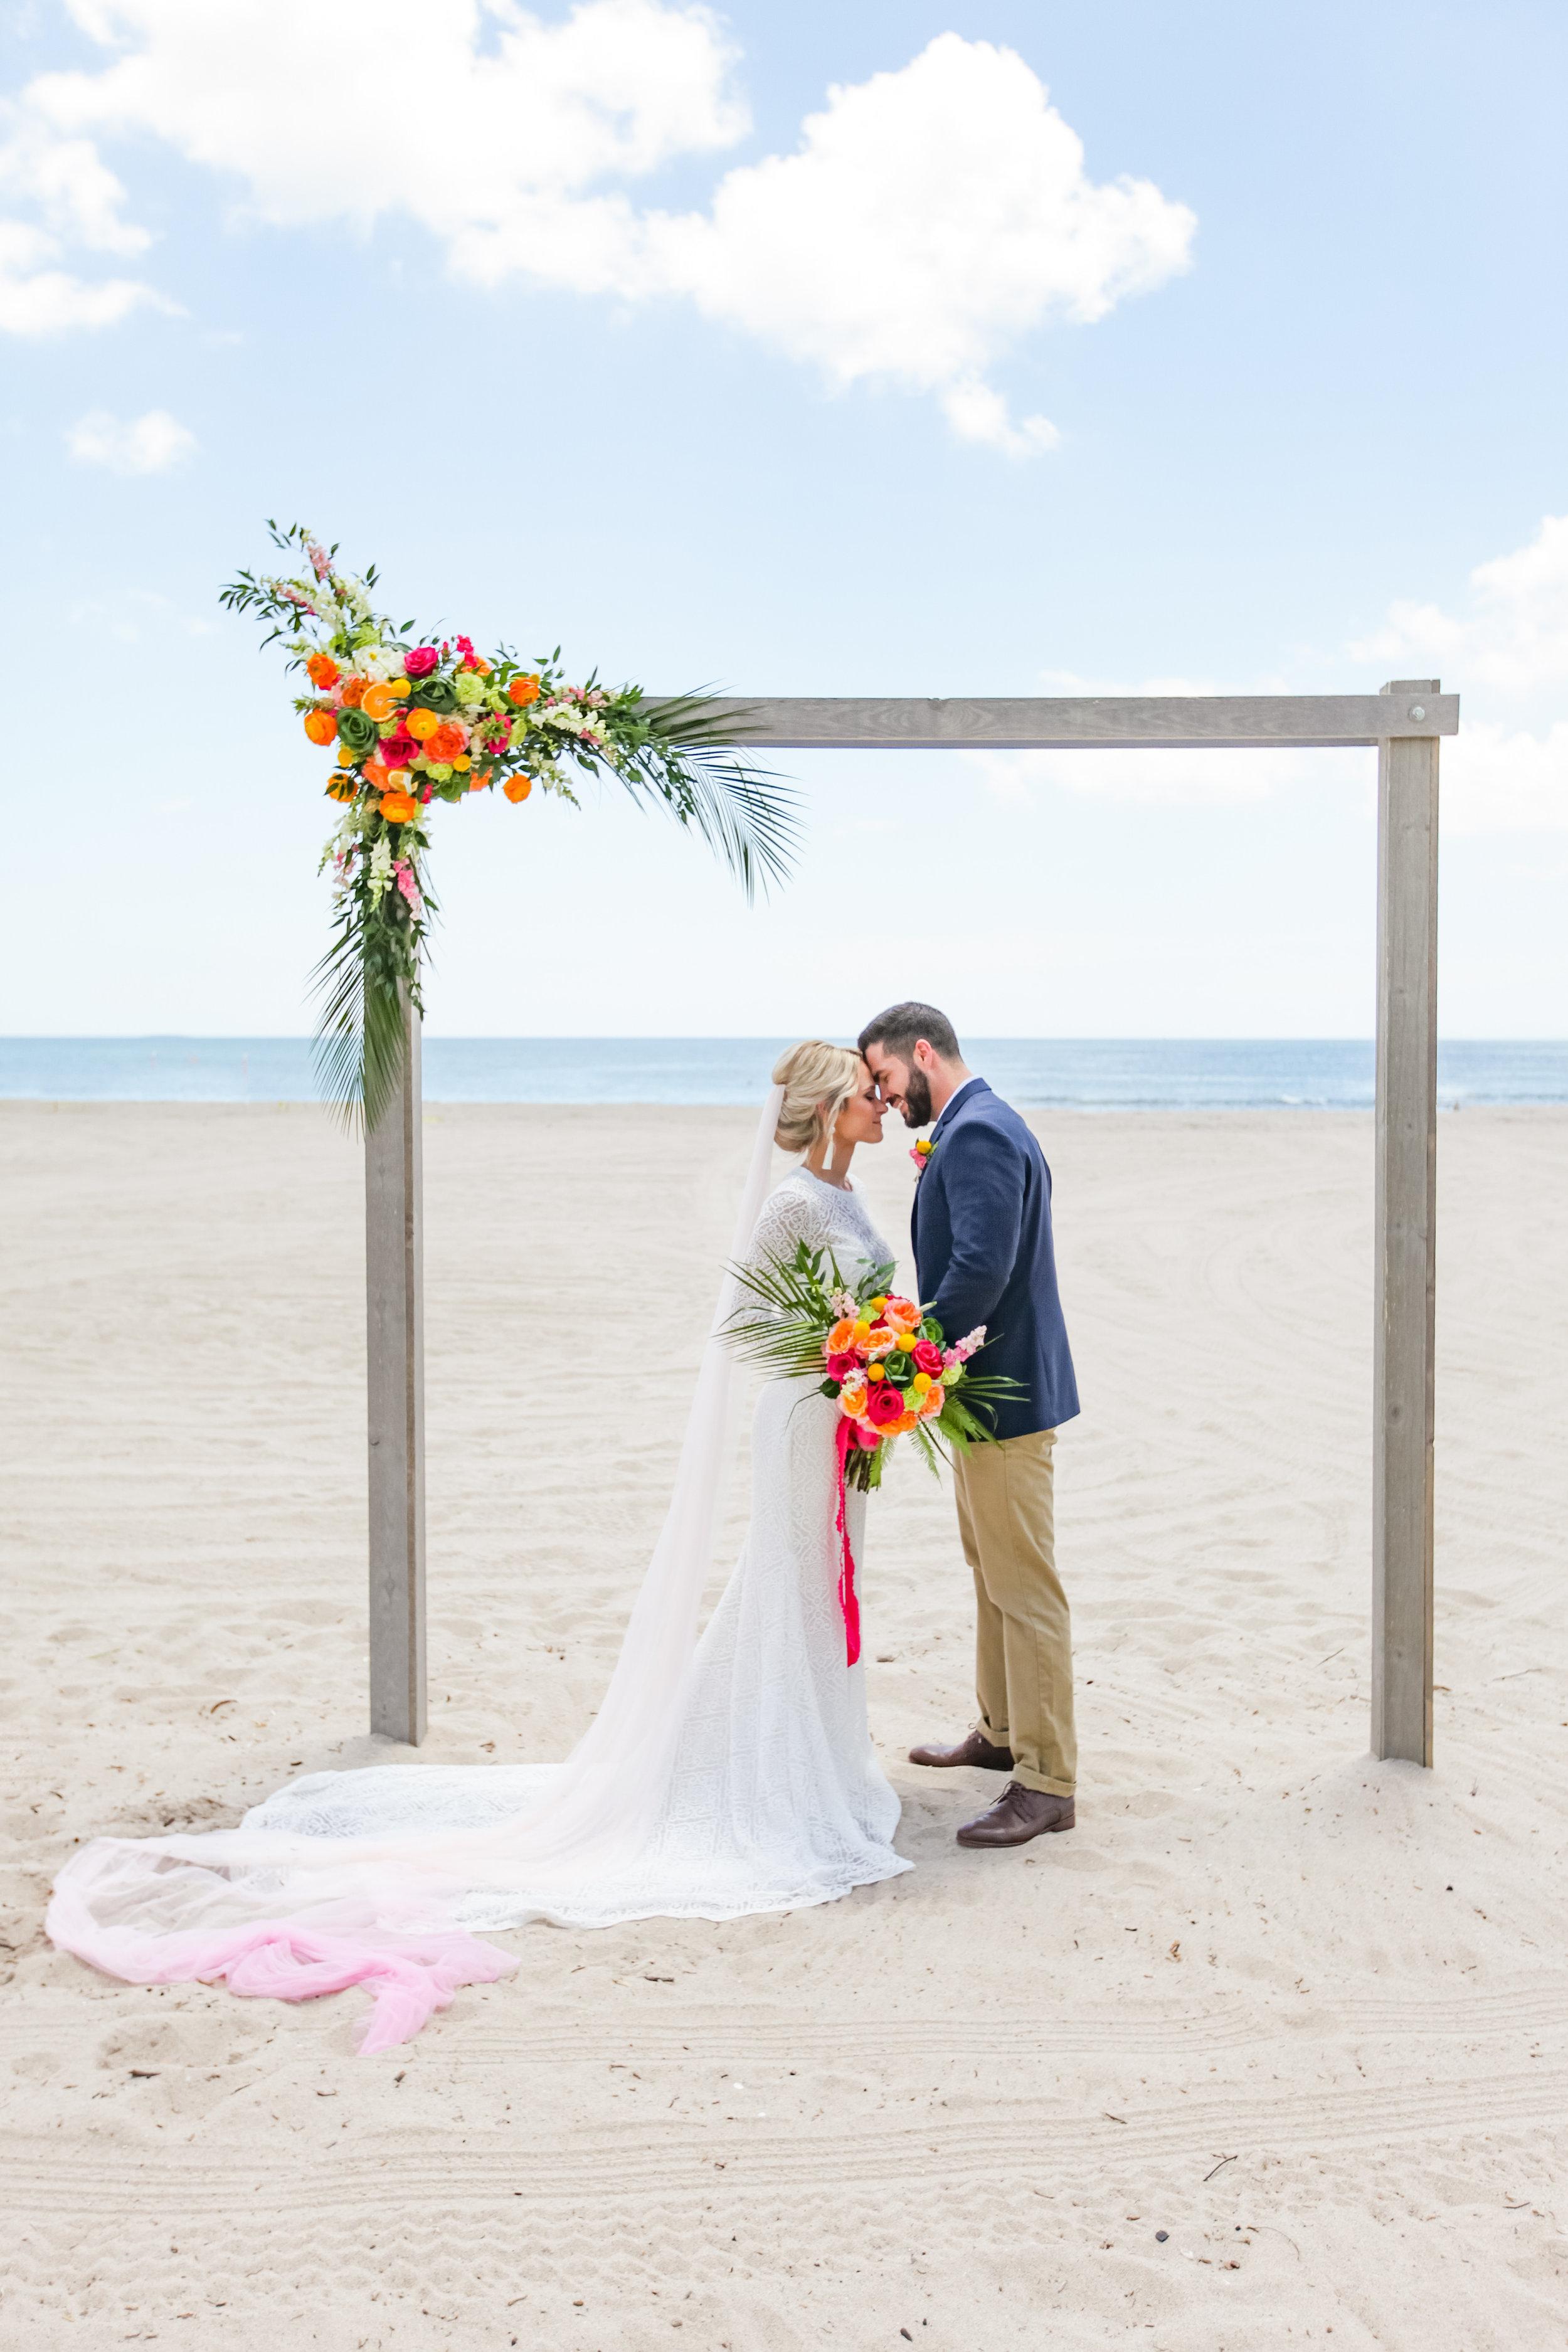 Blush Veil, Ombre Veil, Ombre wedding, Ombre blush bridal Veil, Blush wedding, Champagne and GRIT - Copy.jpg